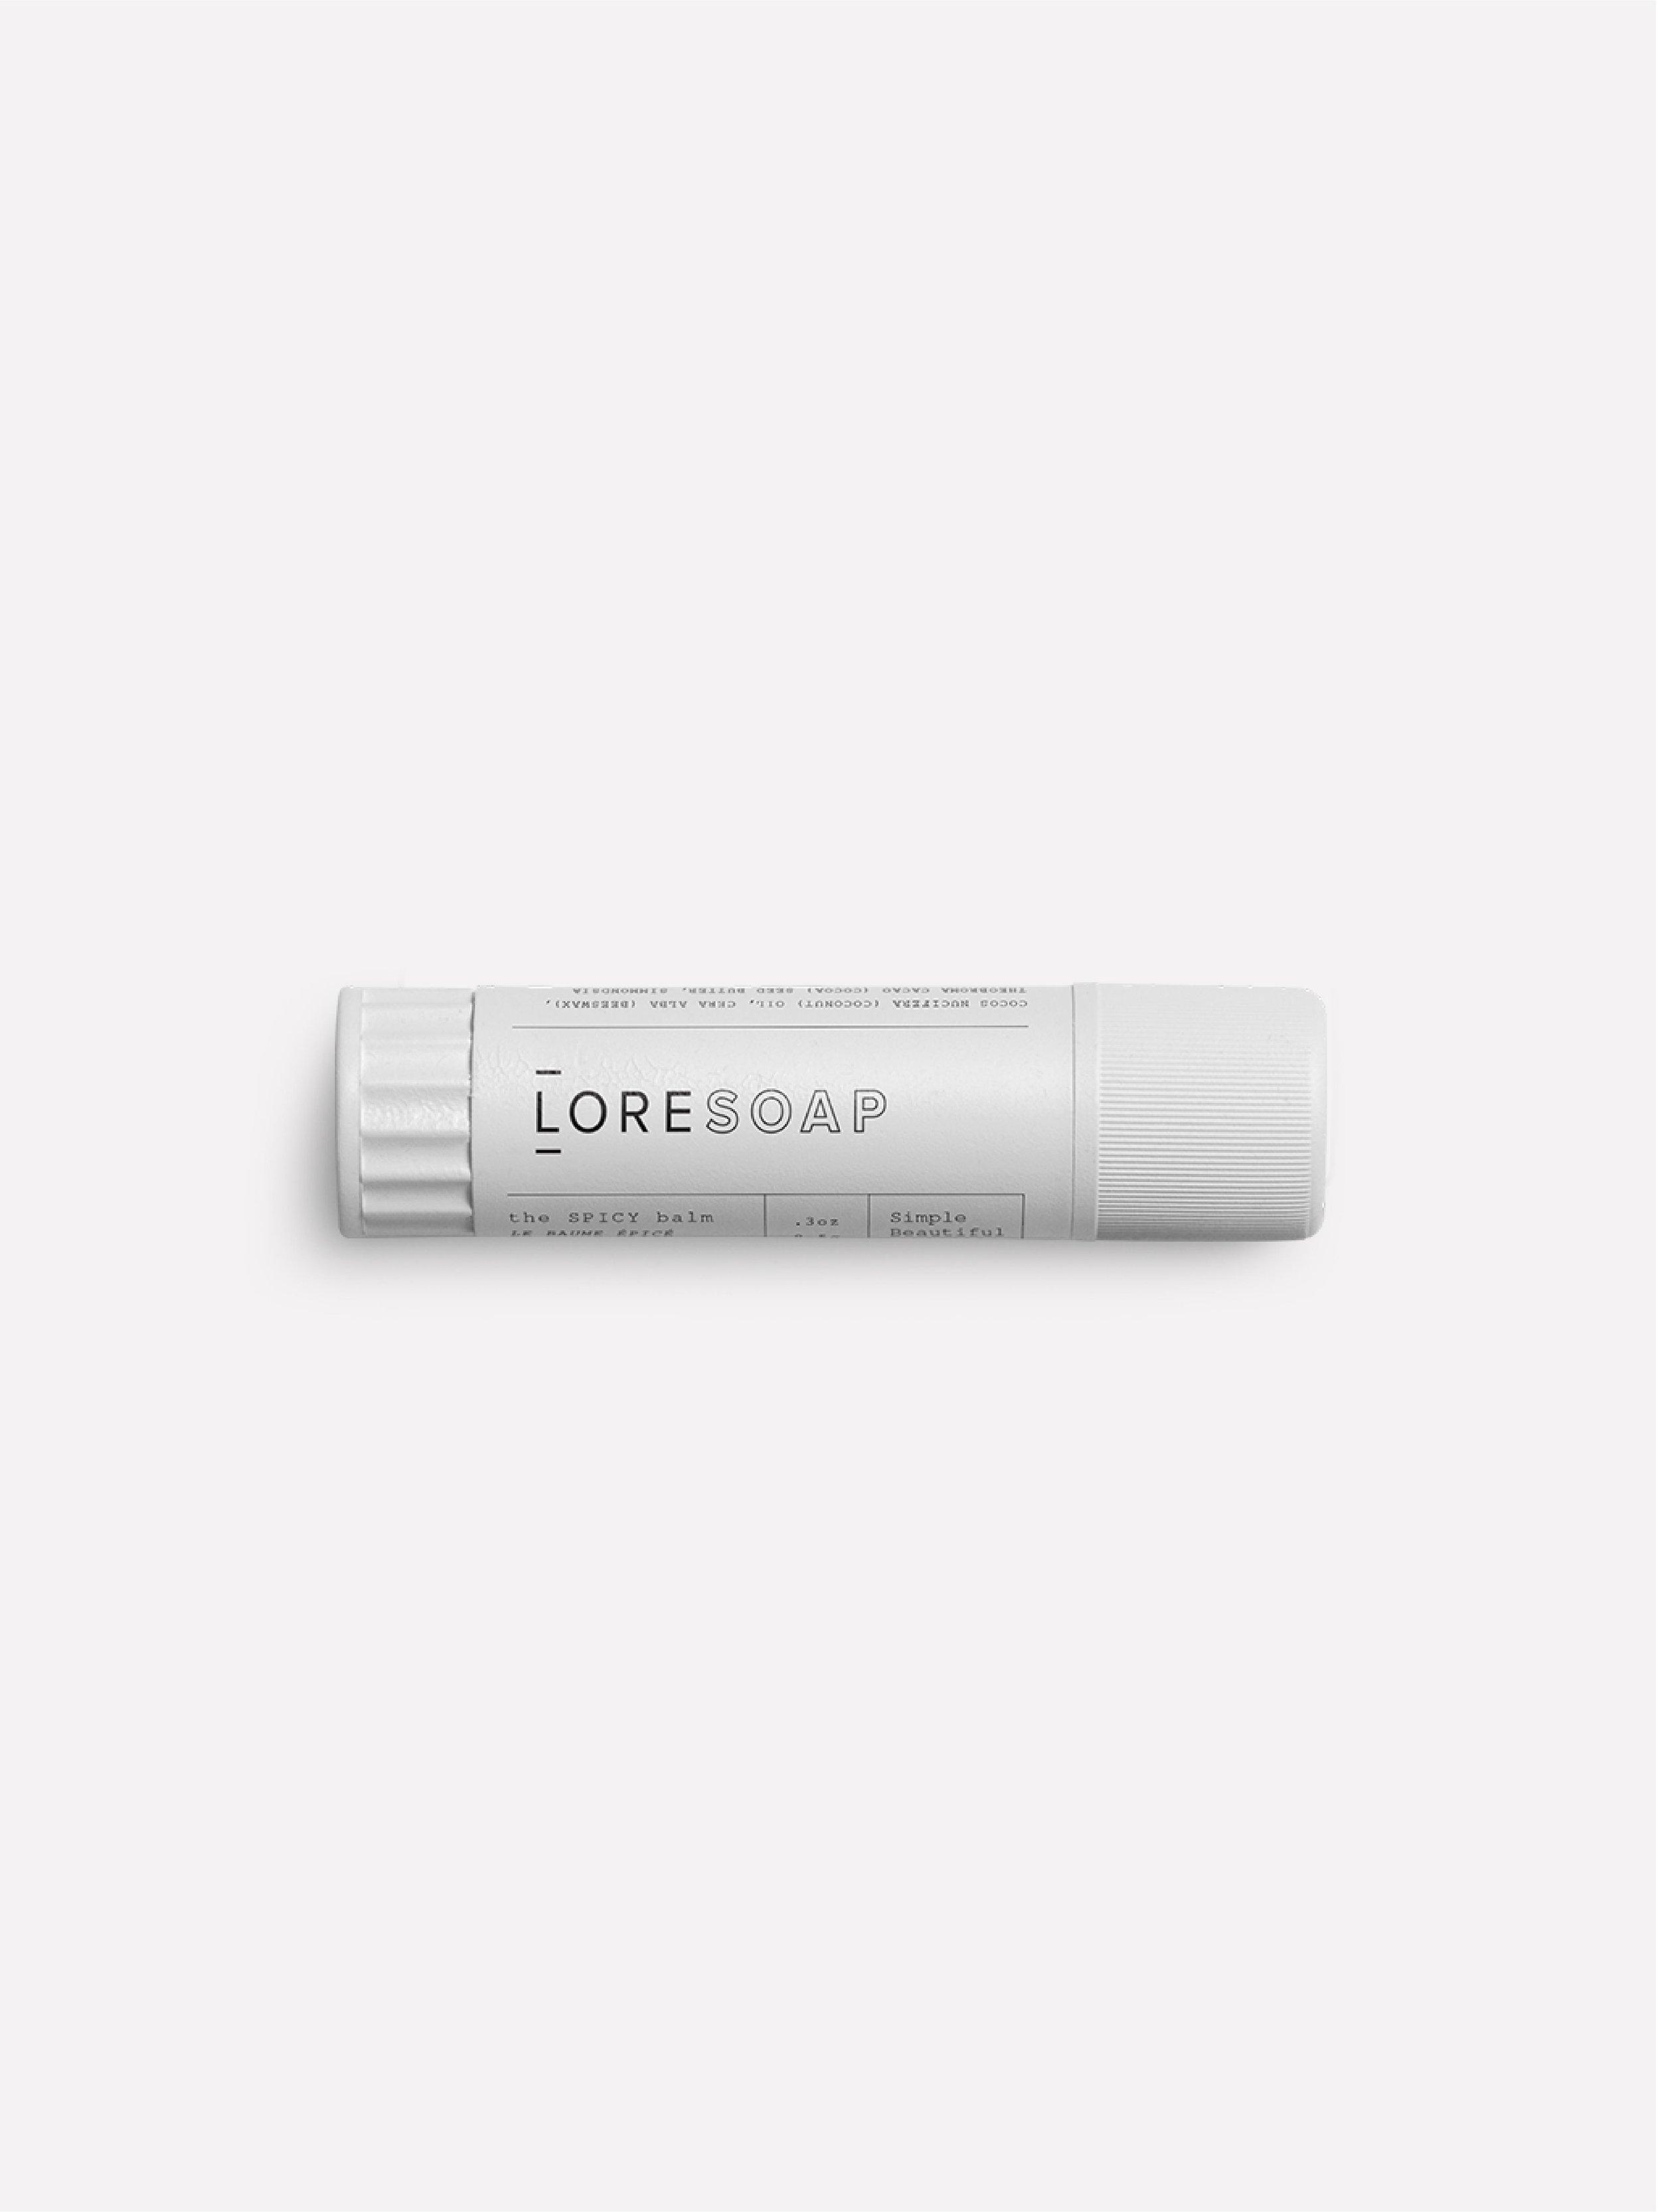 swell-yyc-lore-soap-branding-portfolio-03.jpg